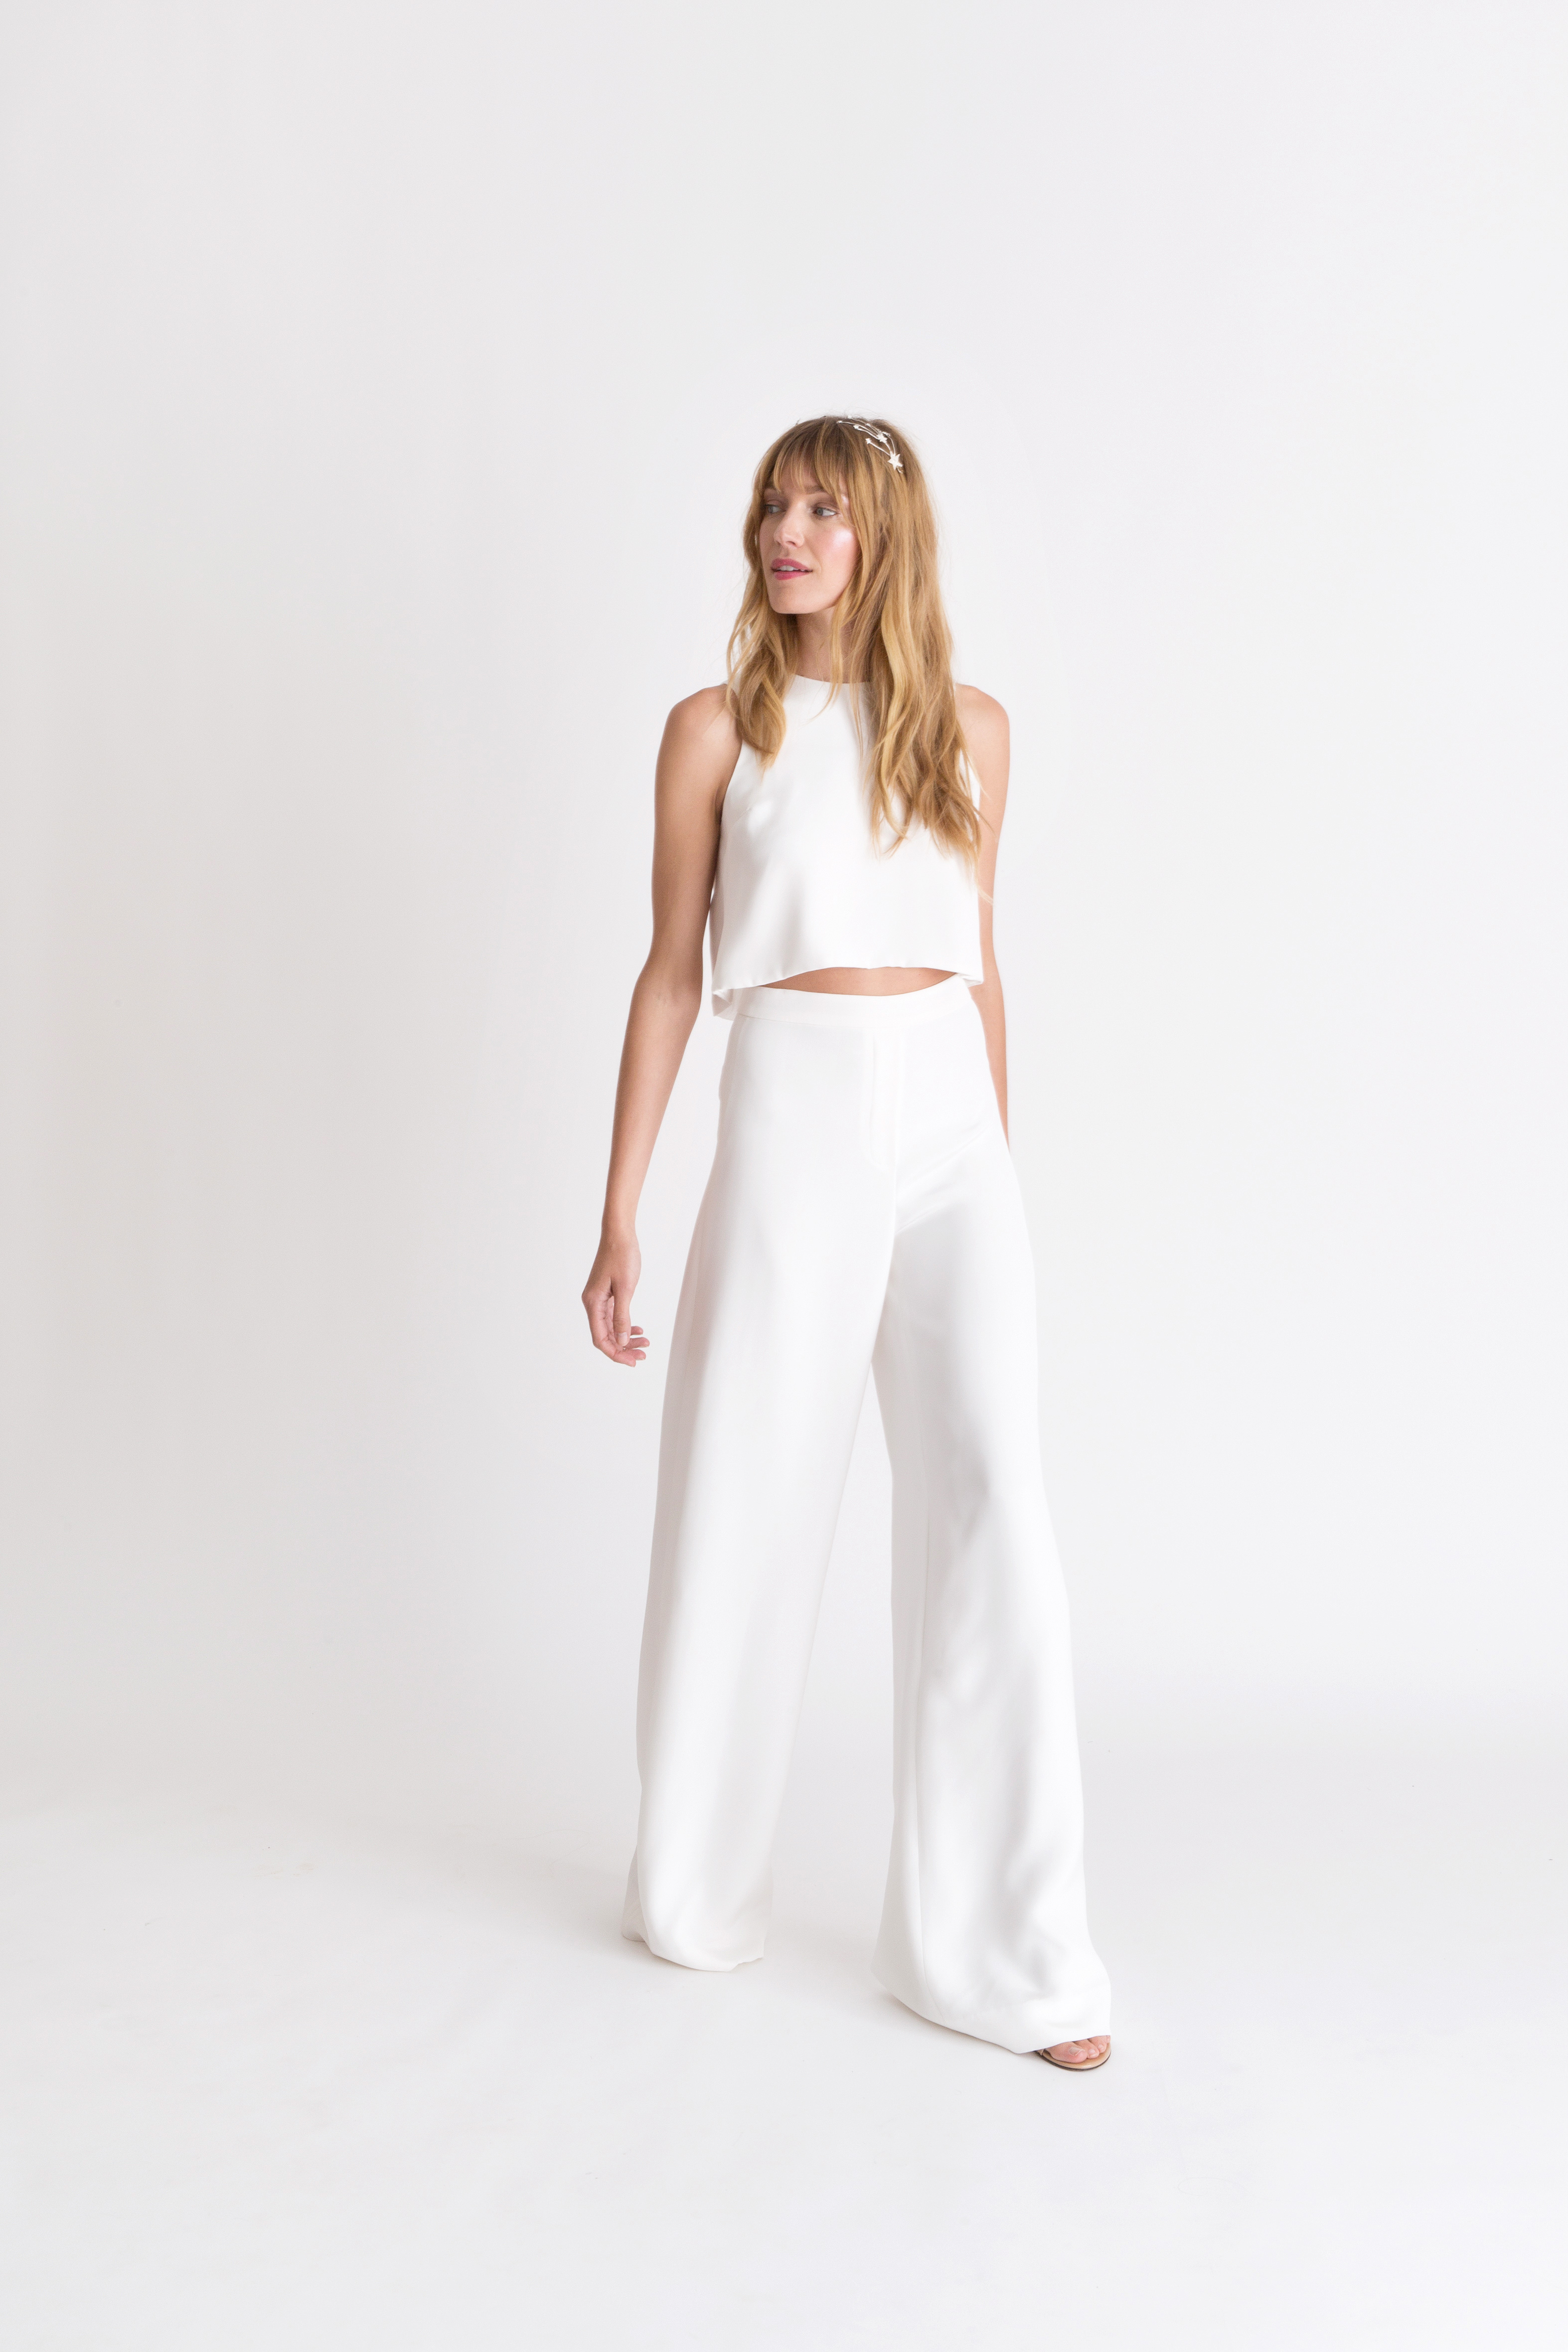 alexandra grecco pantsuit wedding dress spring 2018